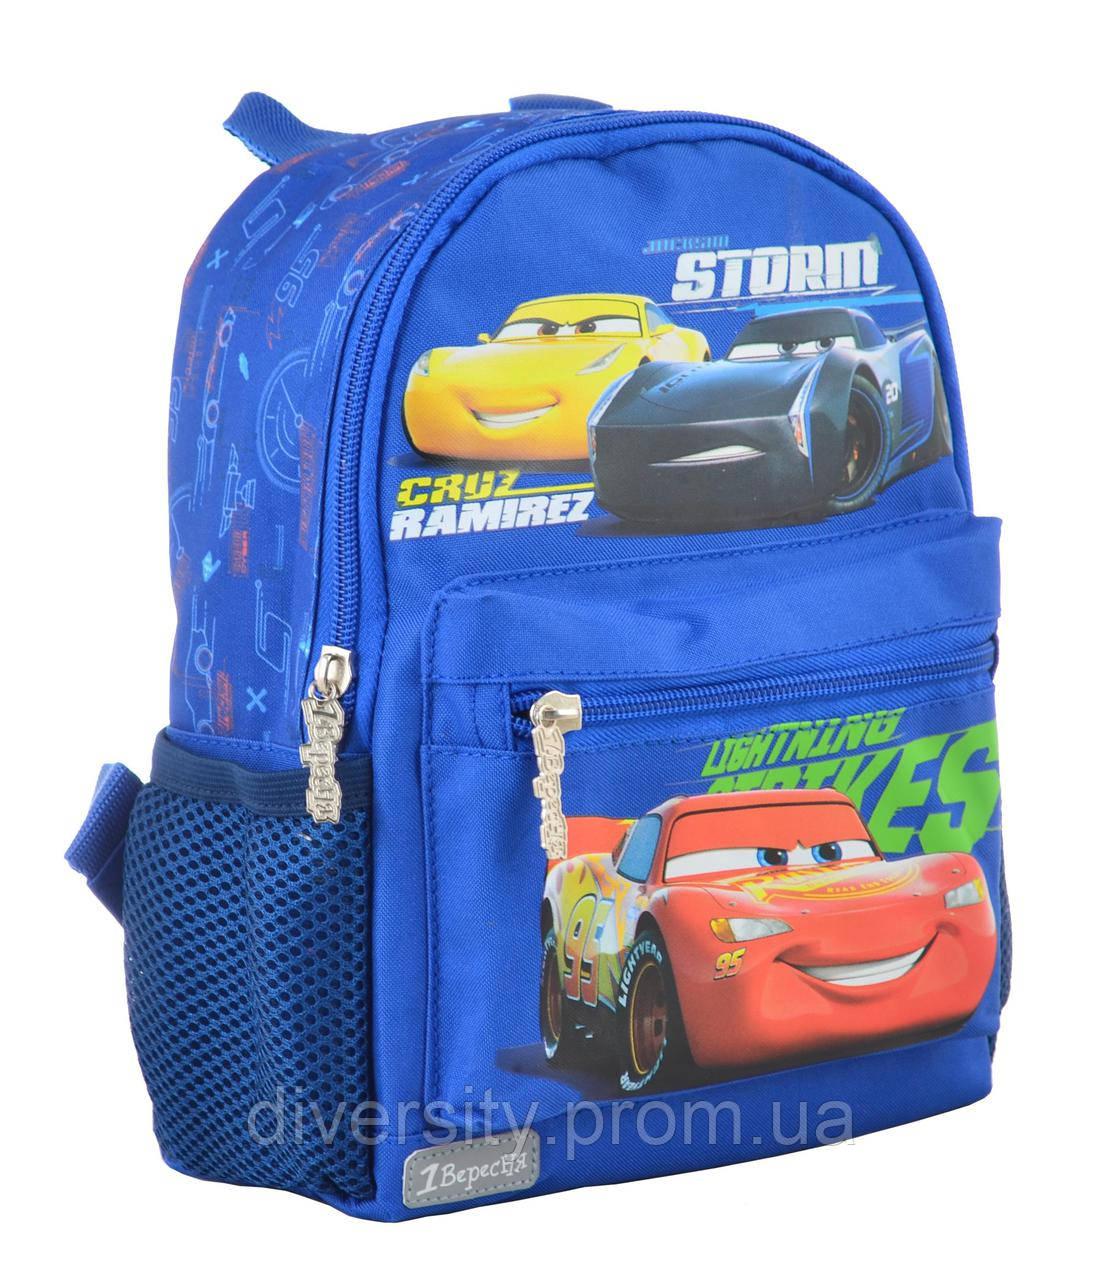 Рюкзак детский K-16 Cars, 21*16.5*14